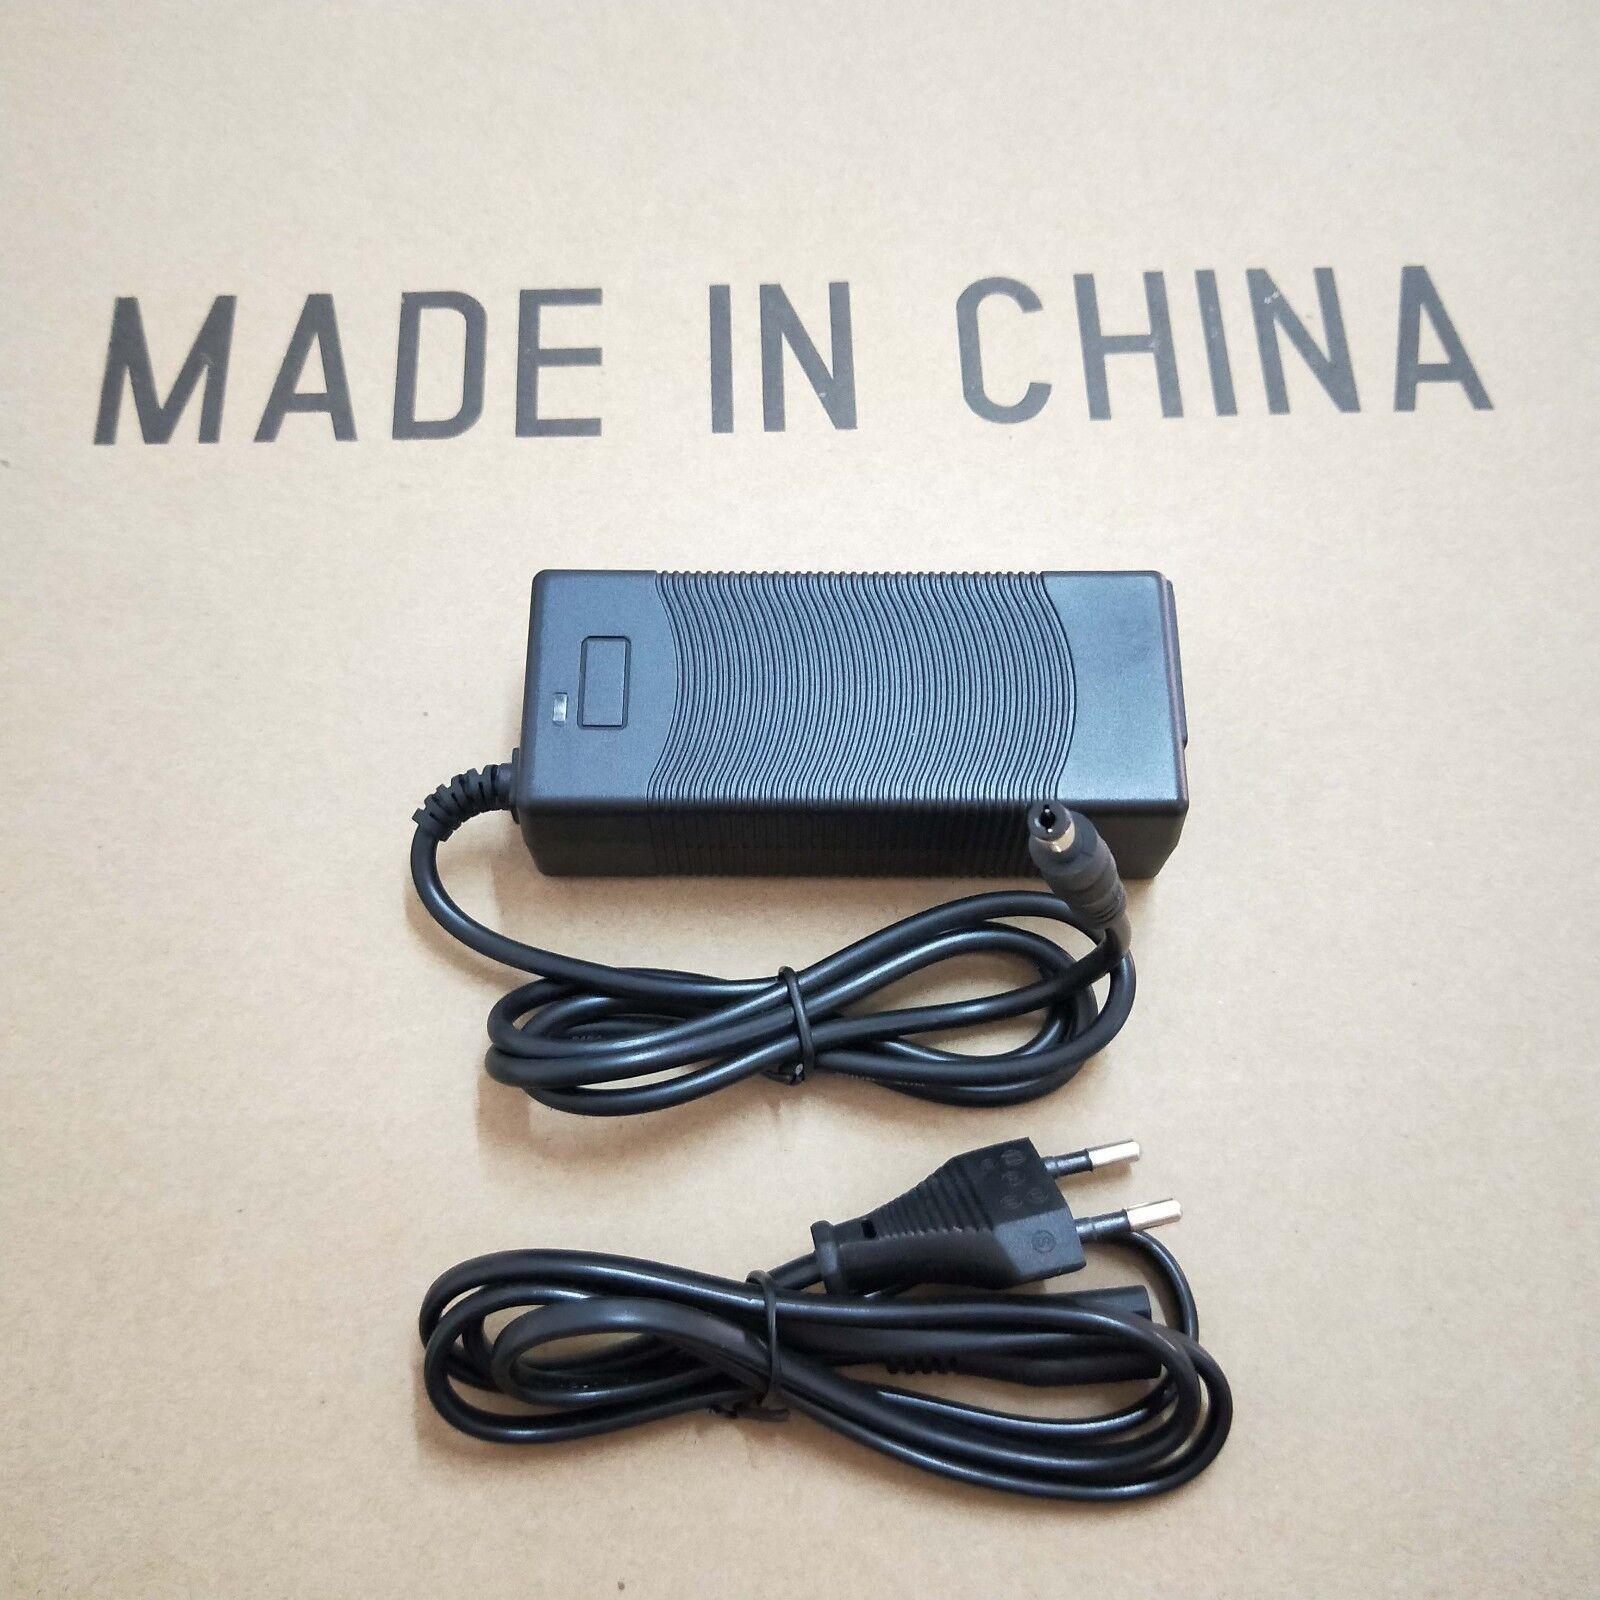 Smart Battery charger 7S Li-ion charger 24V 2A 29.4V 2A with 2.1DC plug 110-220V